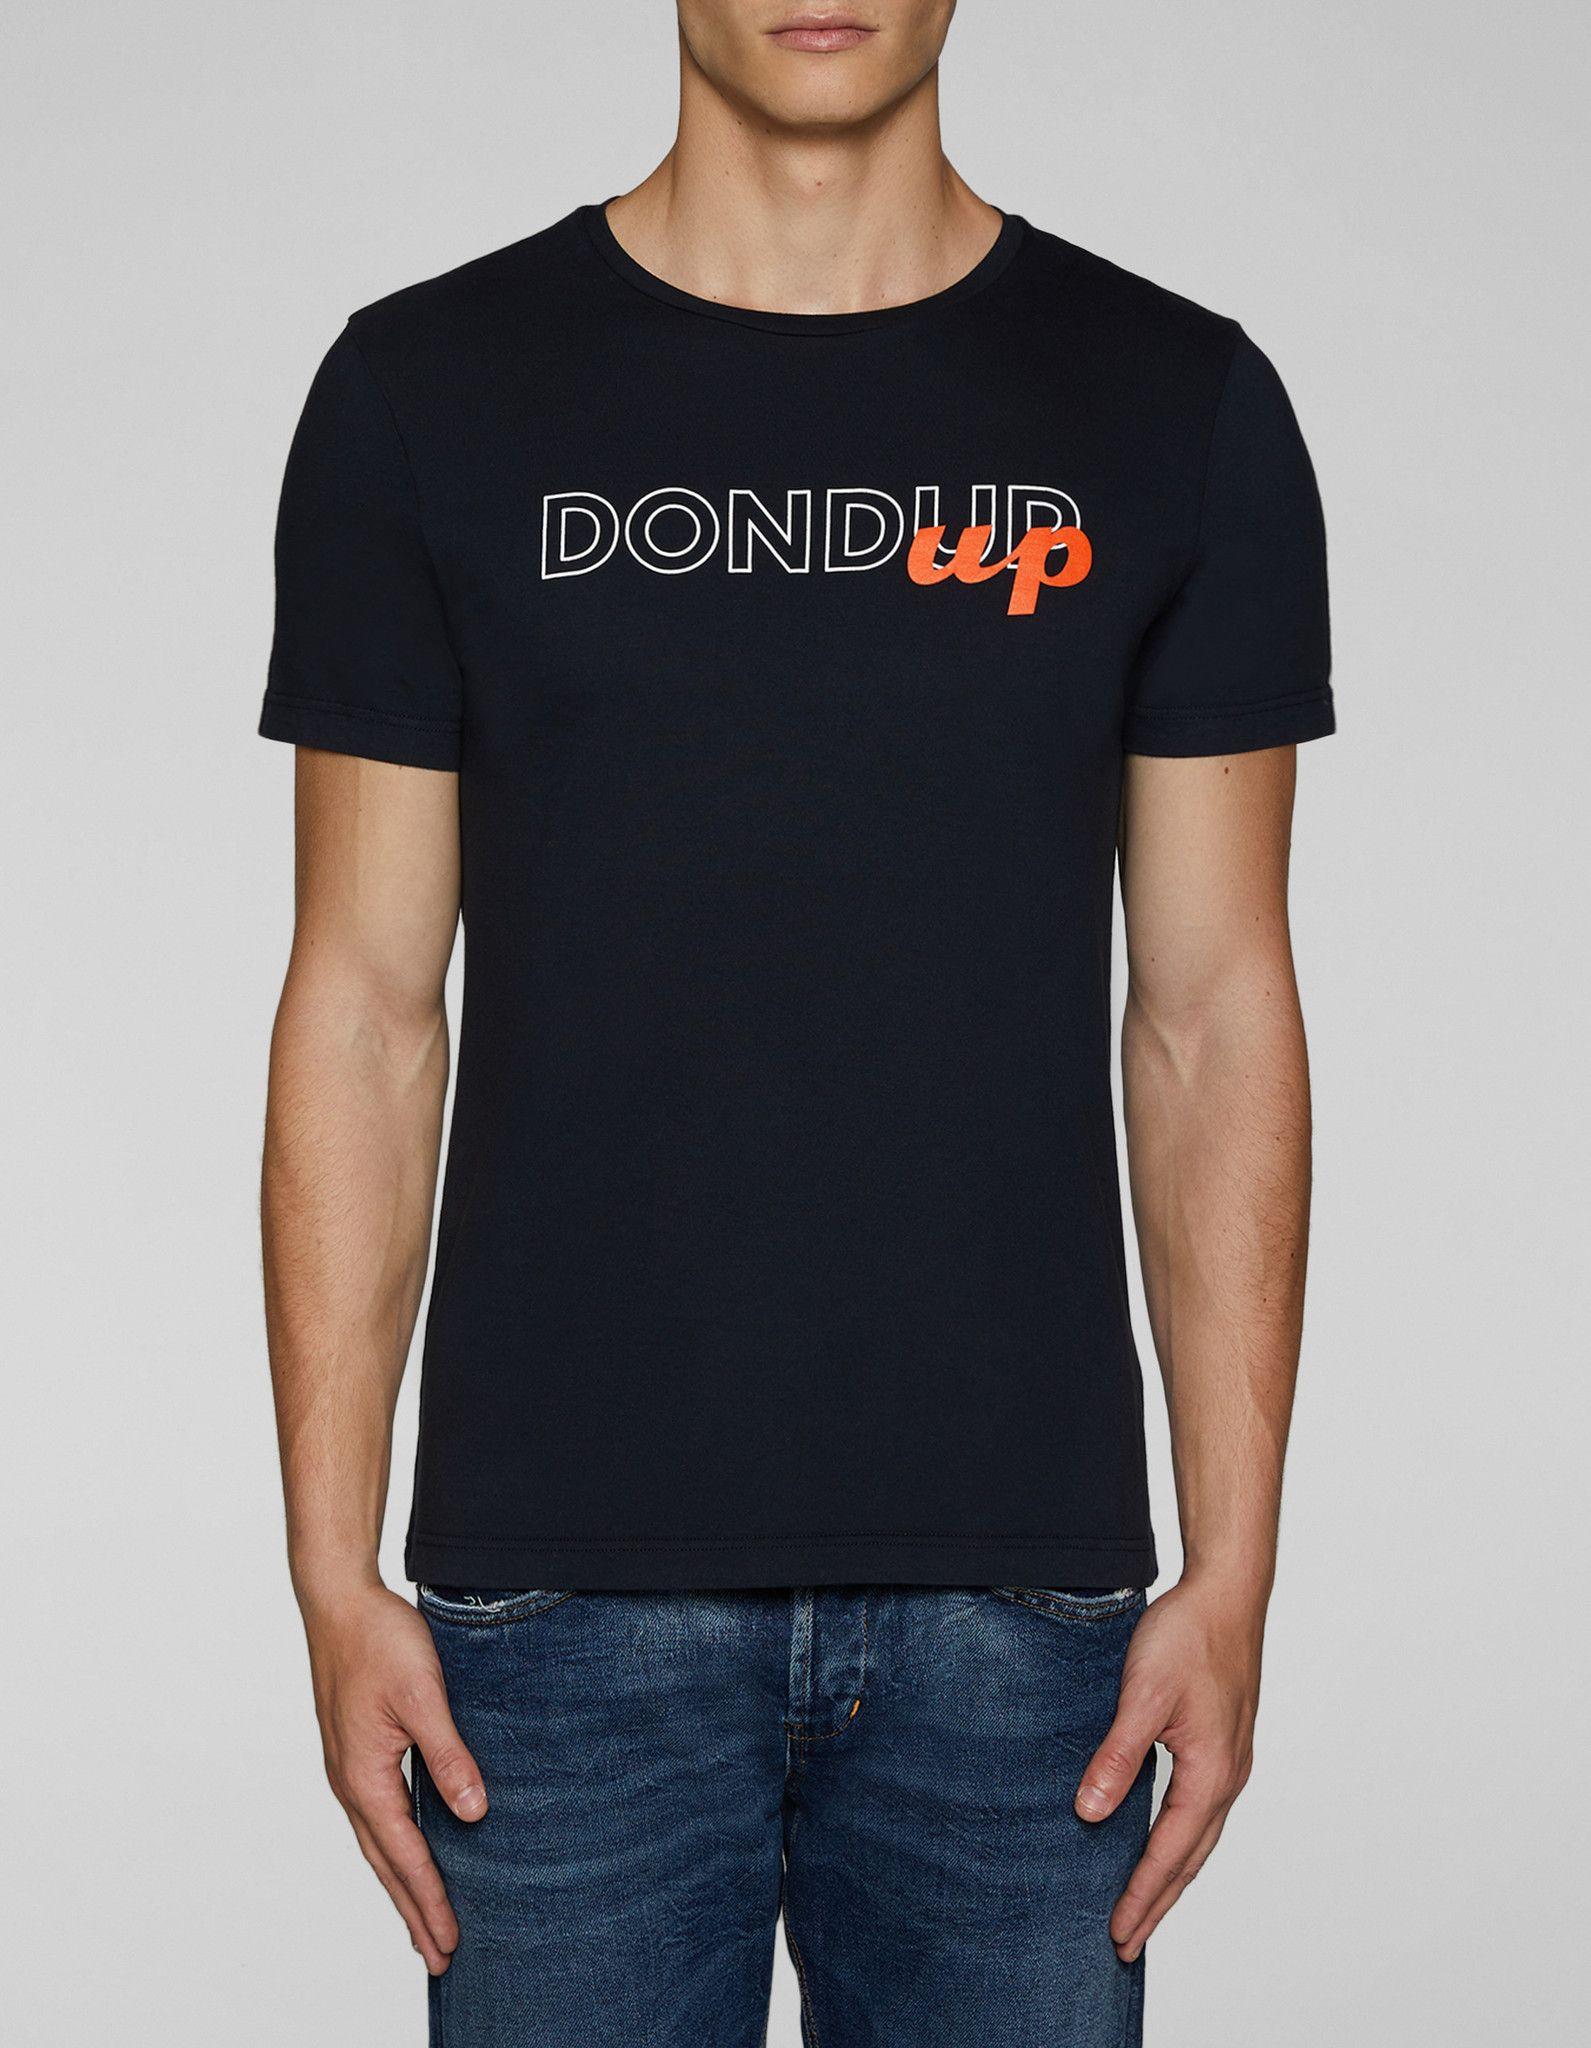 DONDUP T-SHIRT IN COTONE CON LOGO BLU